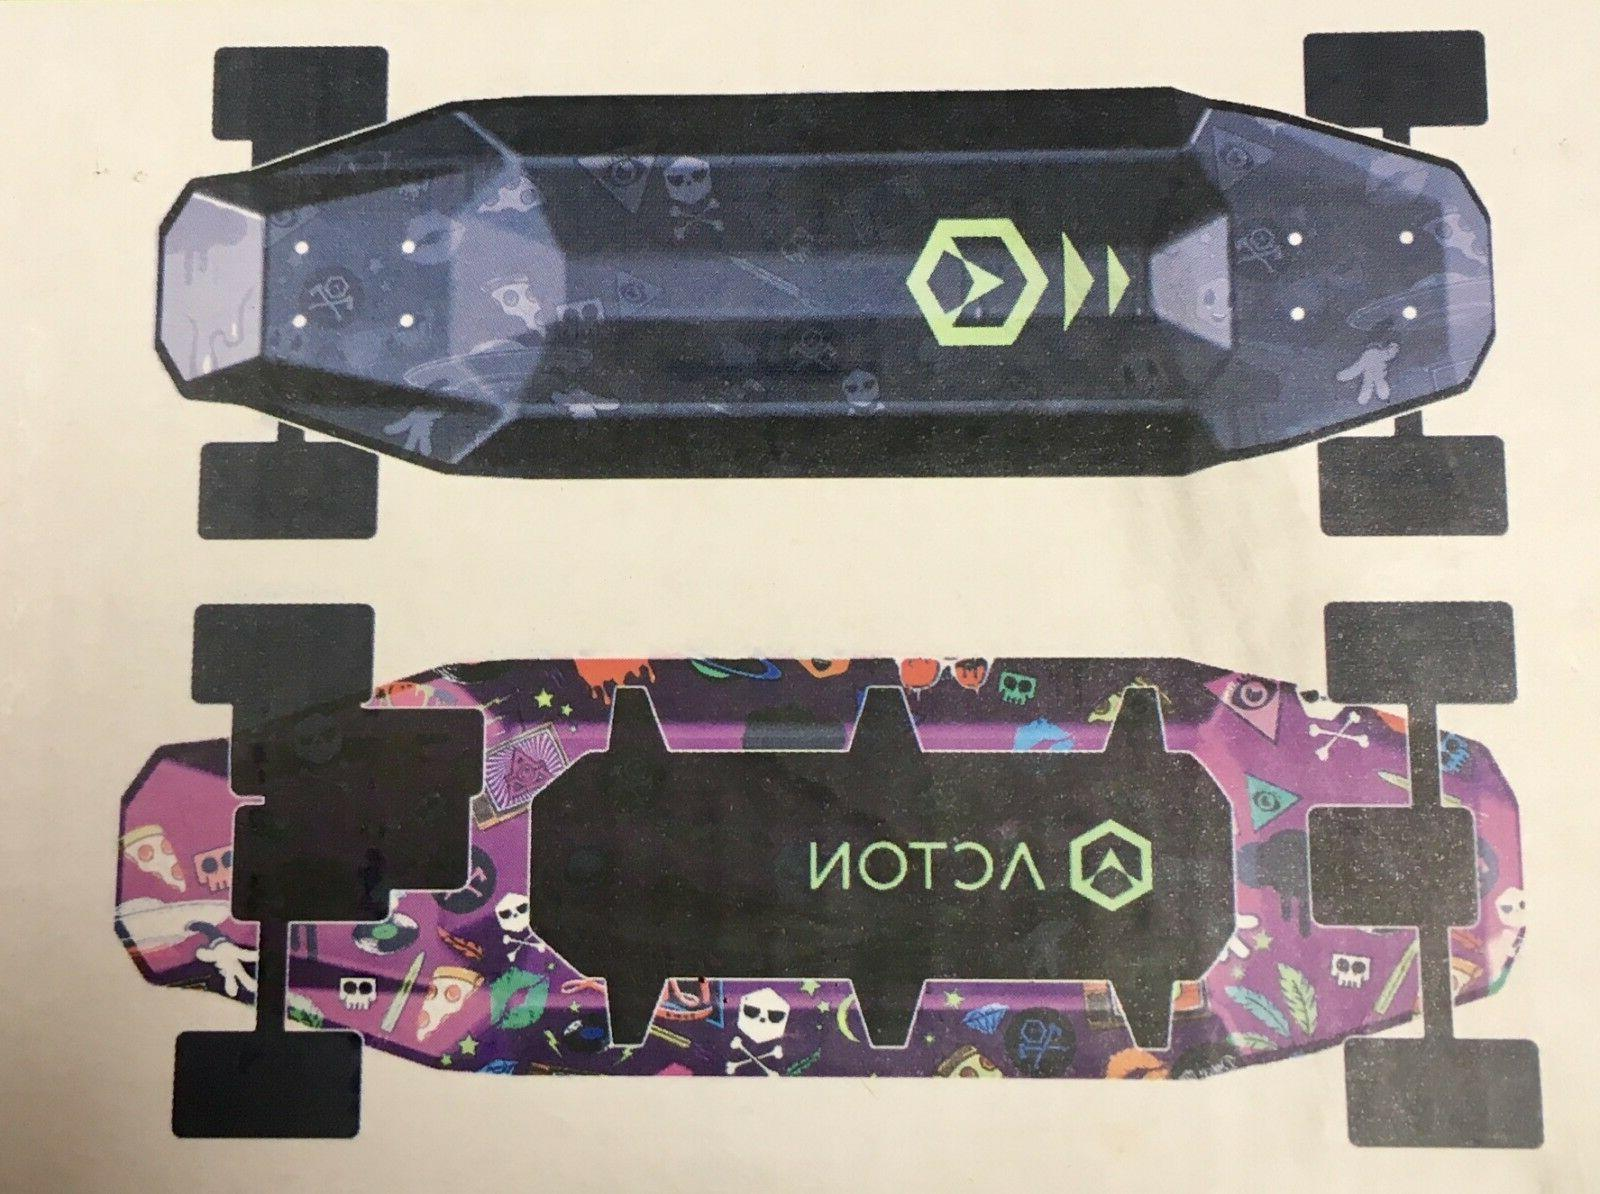 ACTON 30001P Blink Board - Electric Skateboard